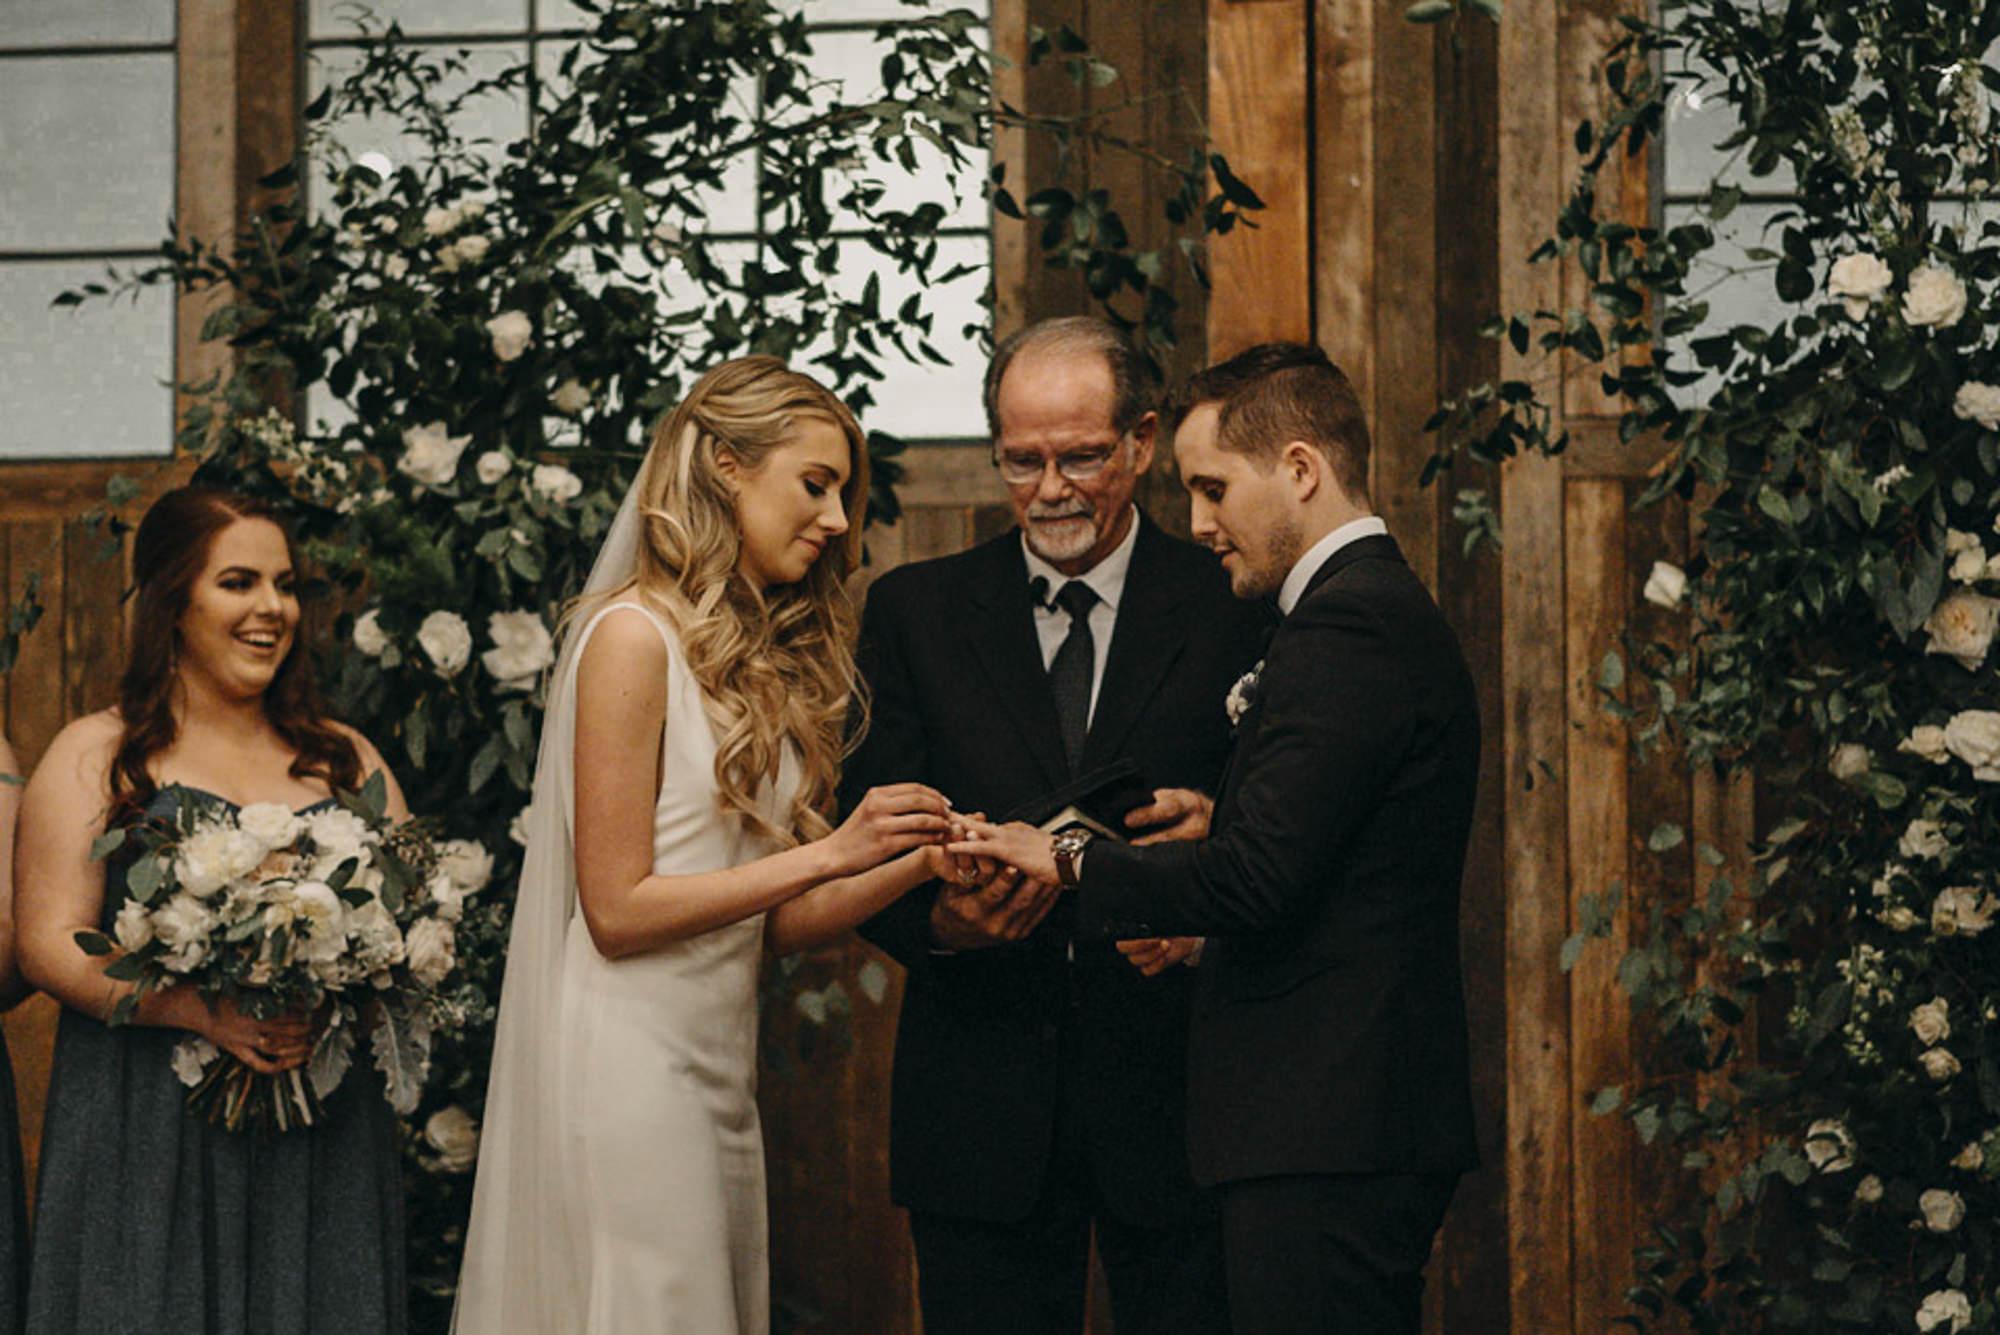 seattle-wedding-sodo-park-photographer-portland-641-9.jpg